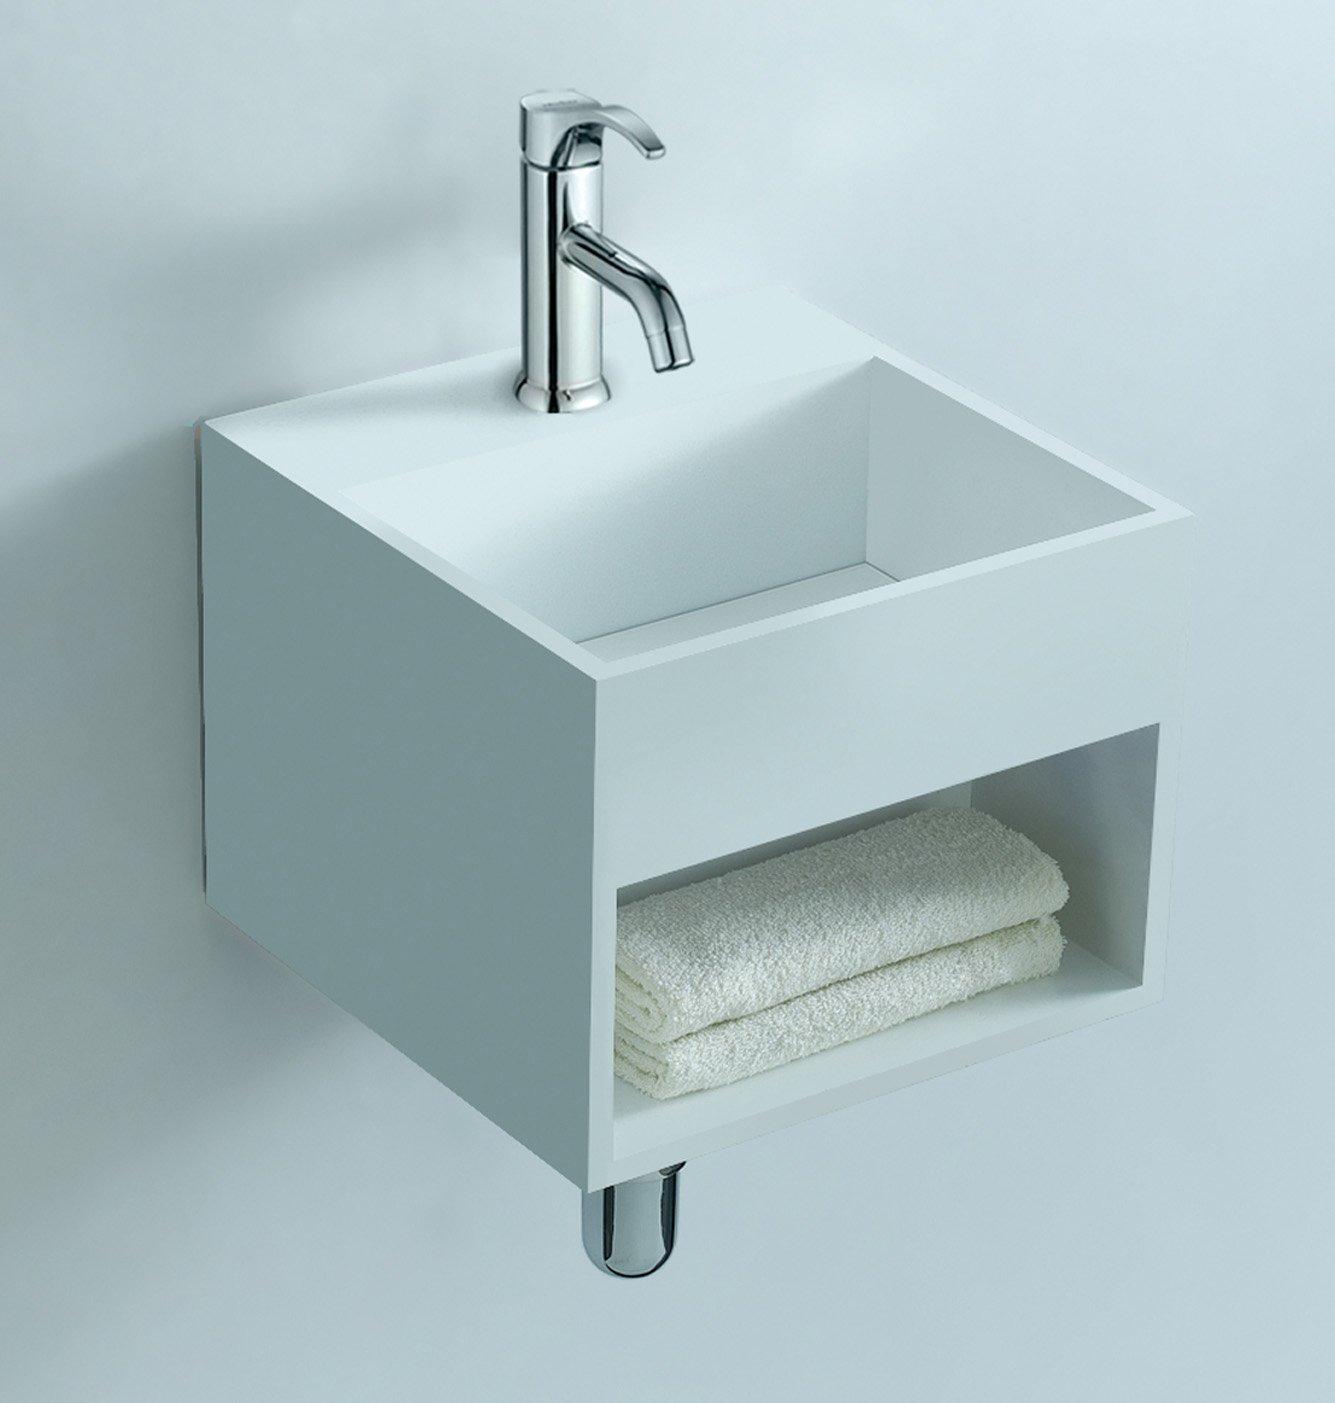 Luca Sanitair Luva vierkant fontein van solid surface 32,5 x 32,5 x 25 cm, mat wit